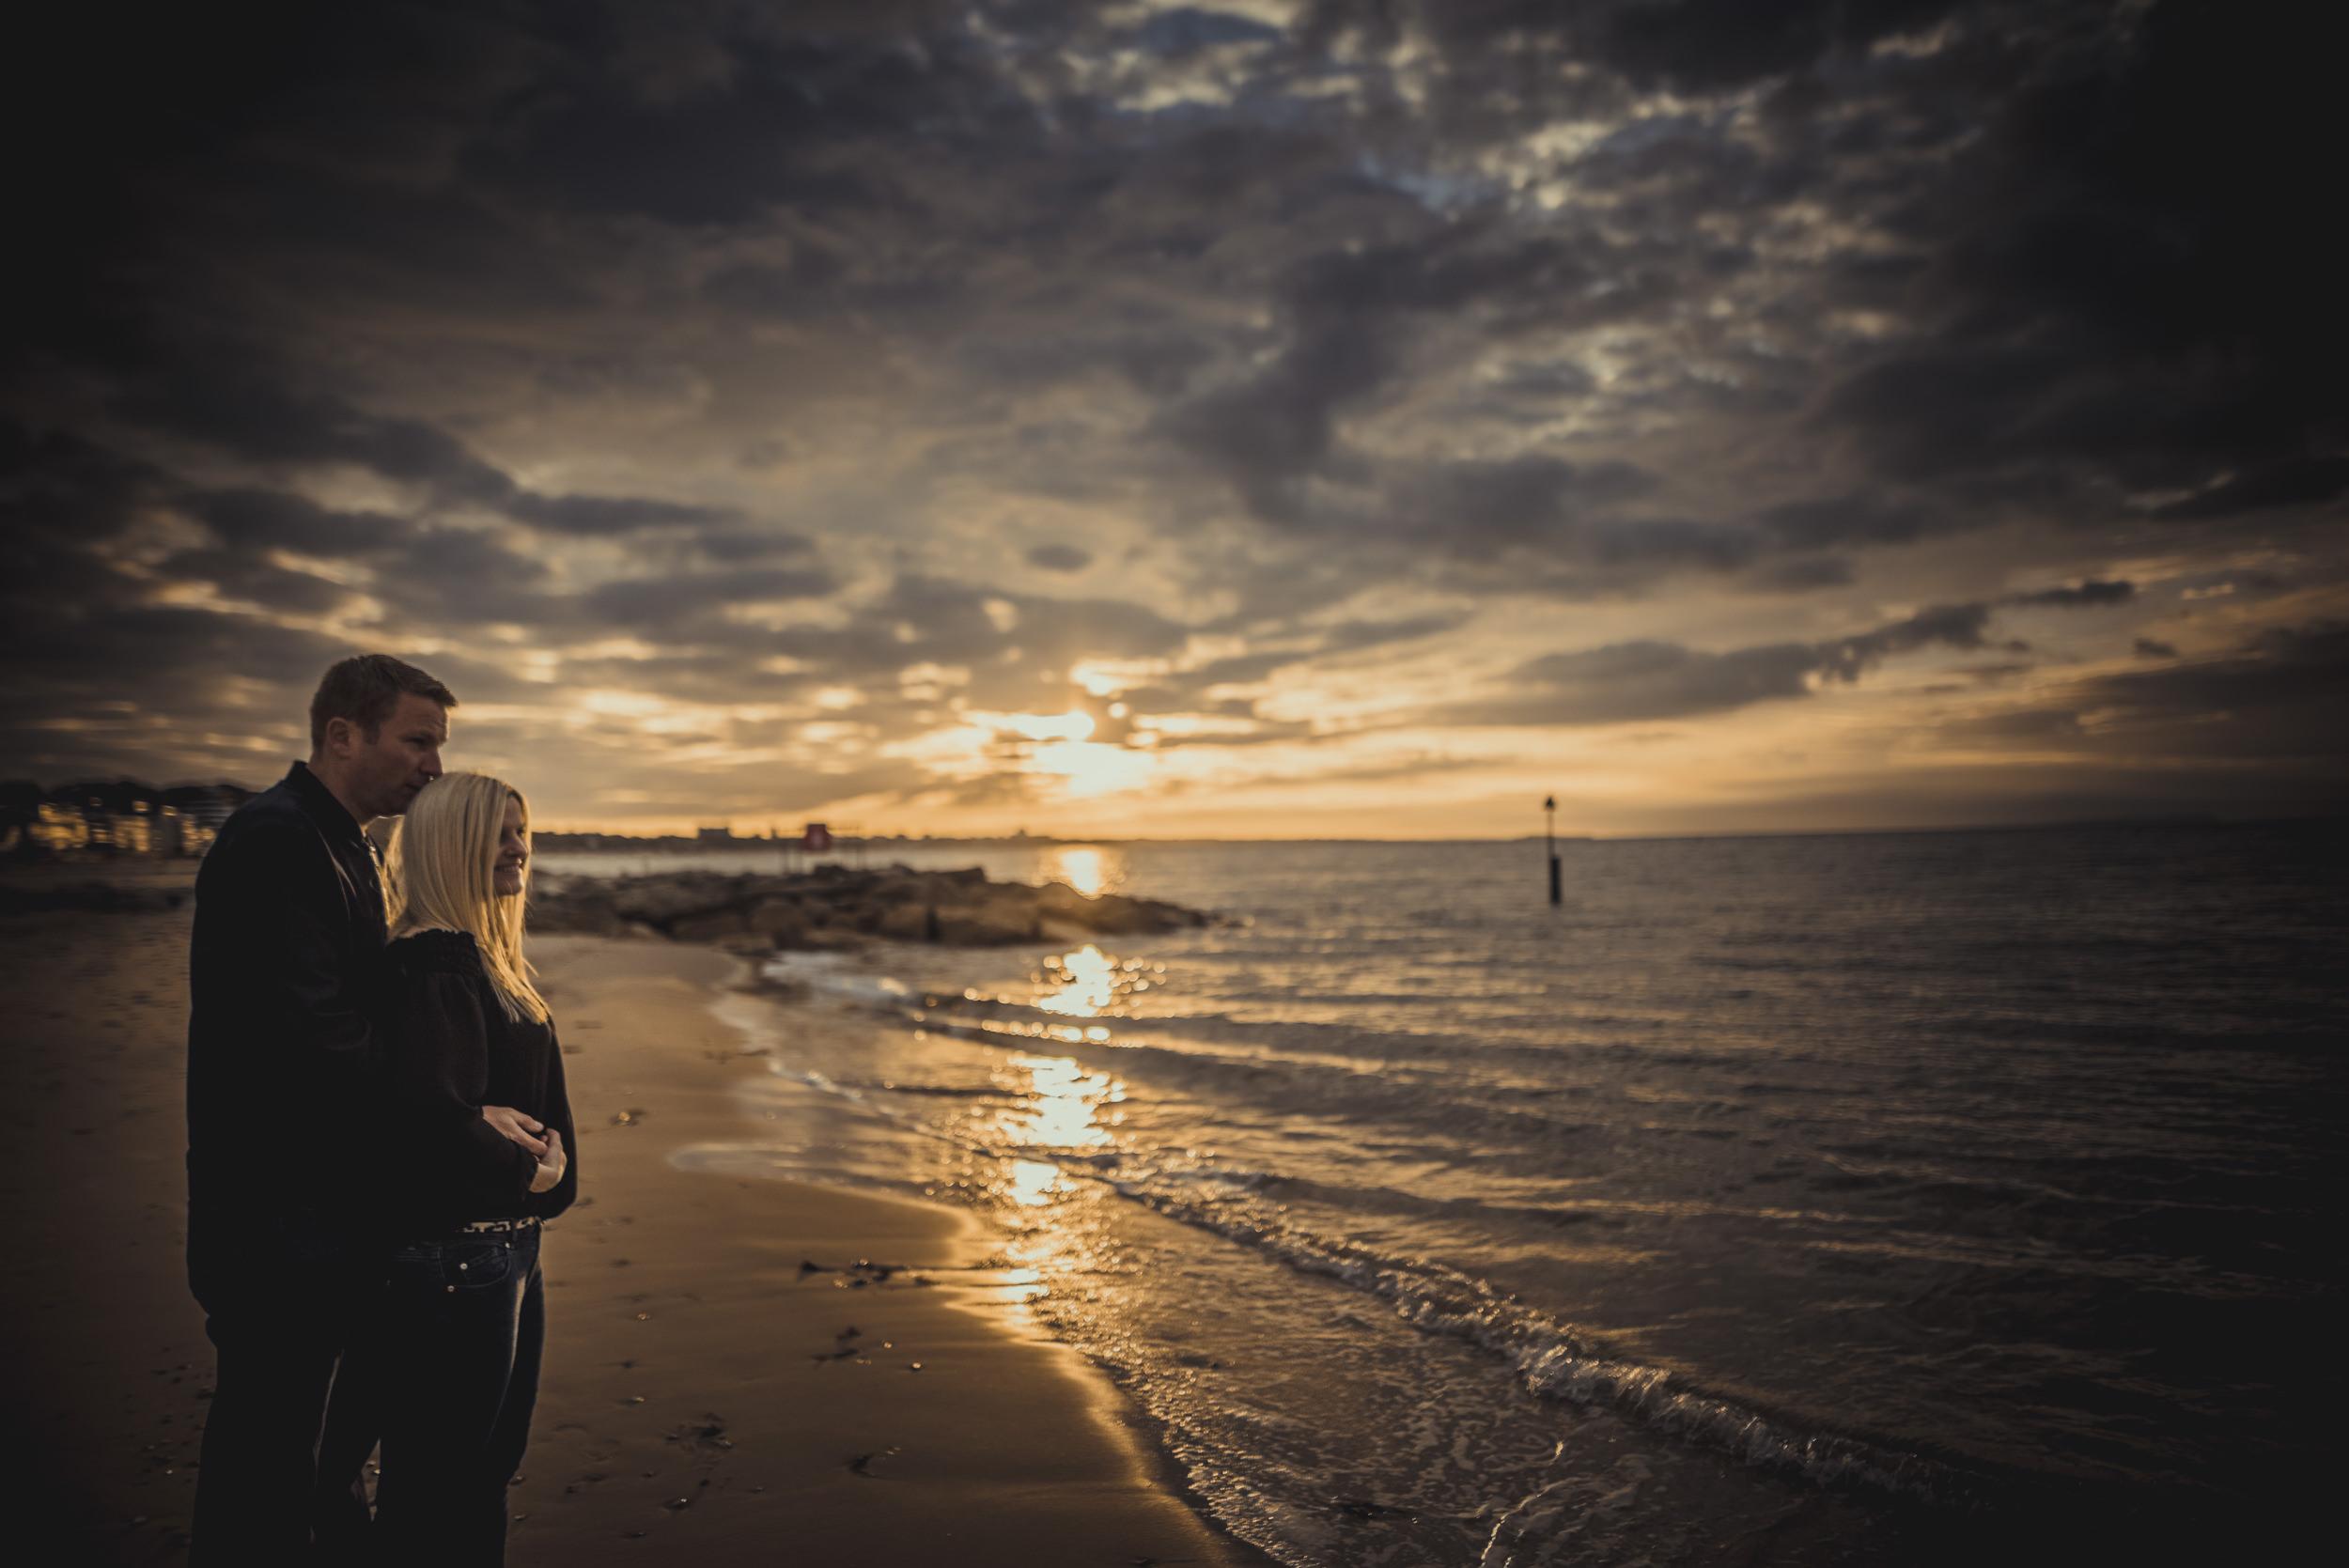 Trisha-and-Robert-Engagement-session-Sandbanks-beach-Poole-Manu-Mendoza-Wedding-Photography-031.jpg